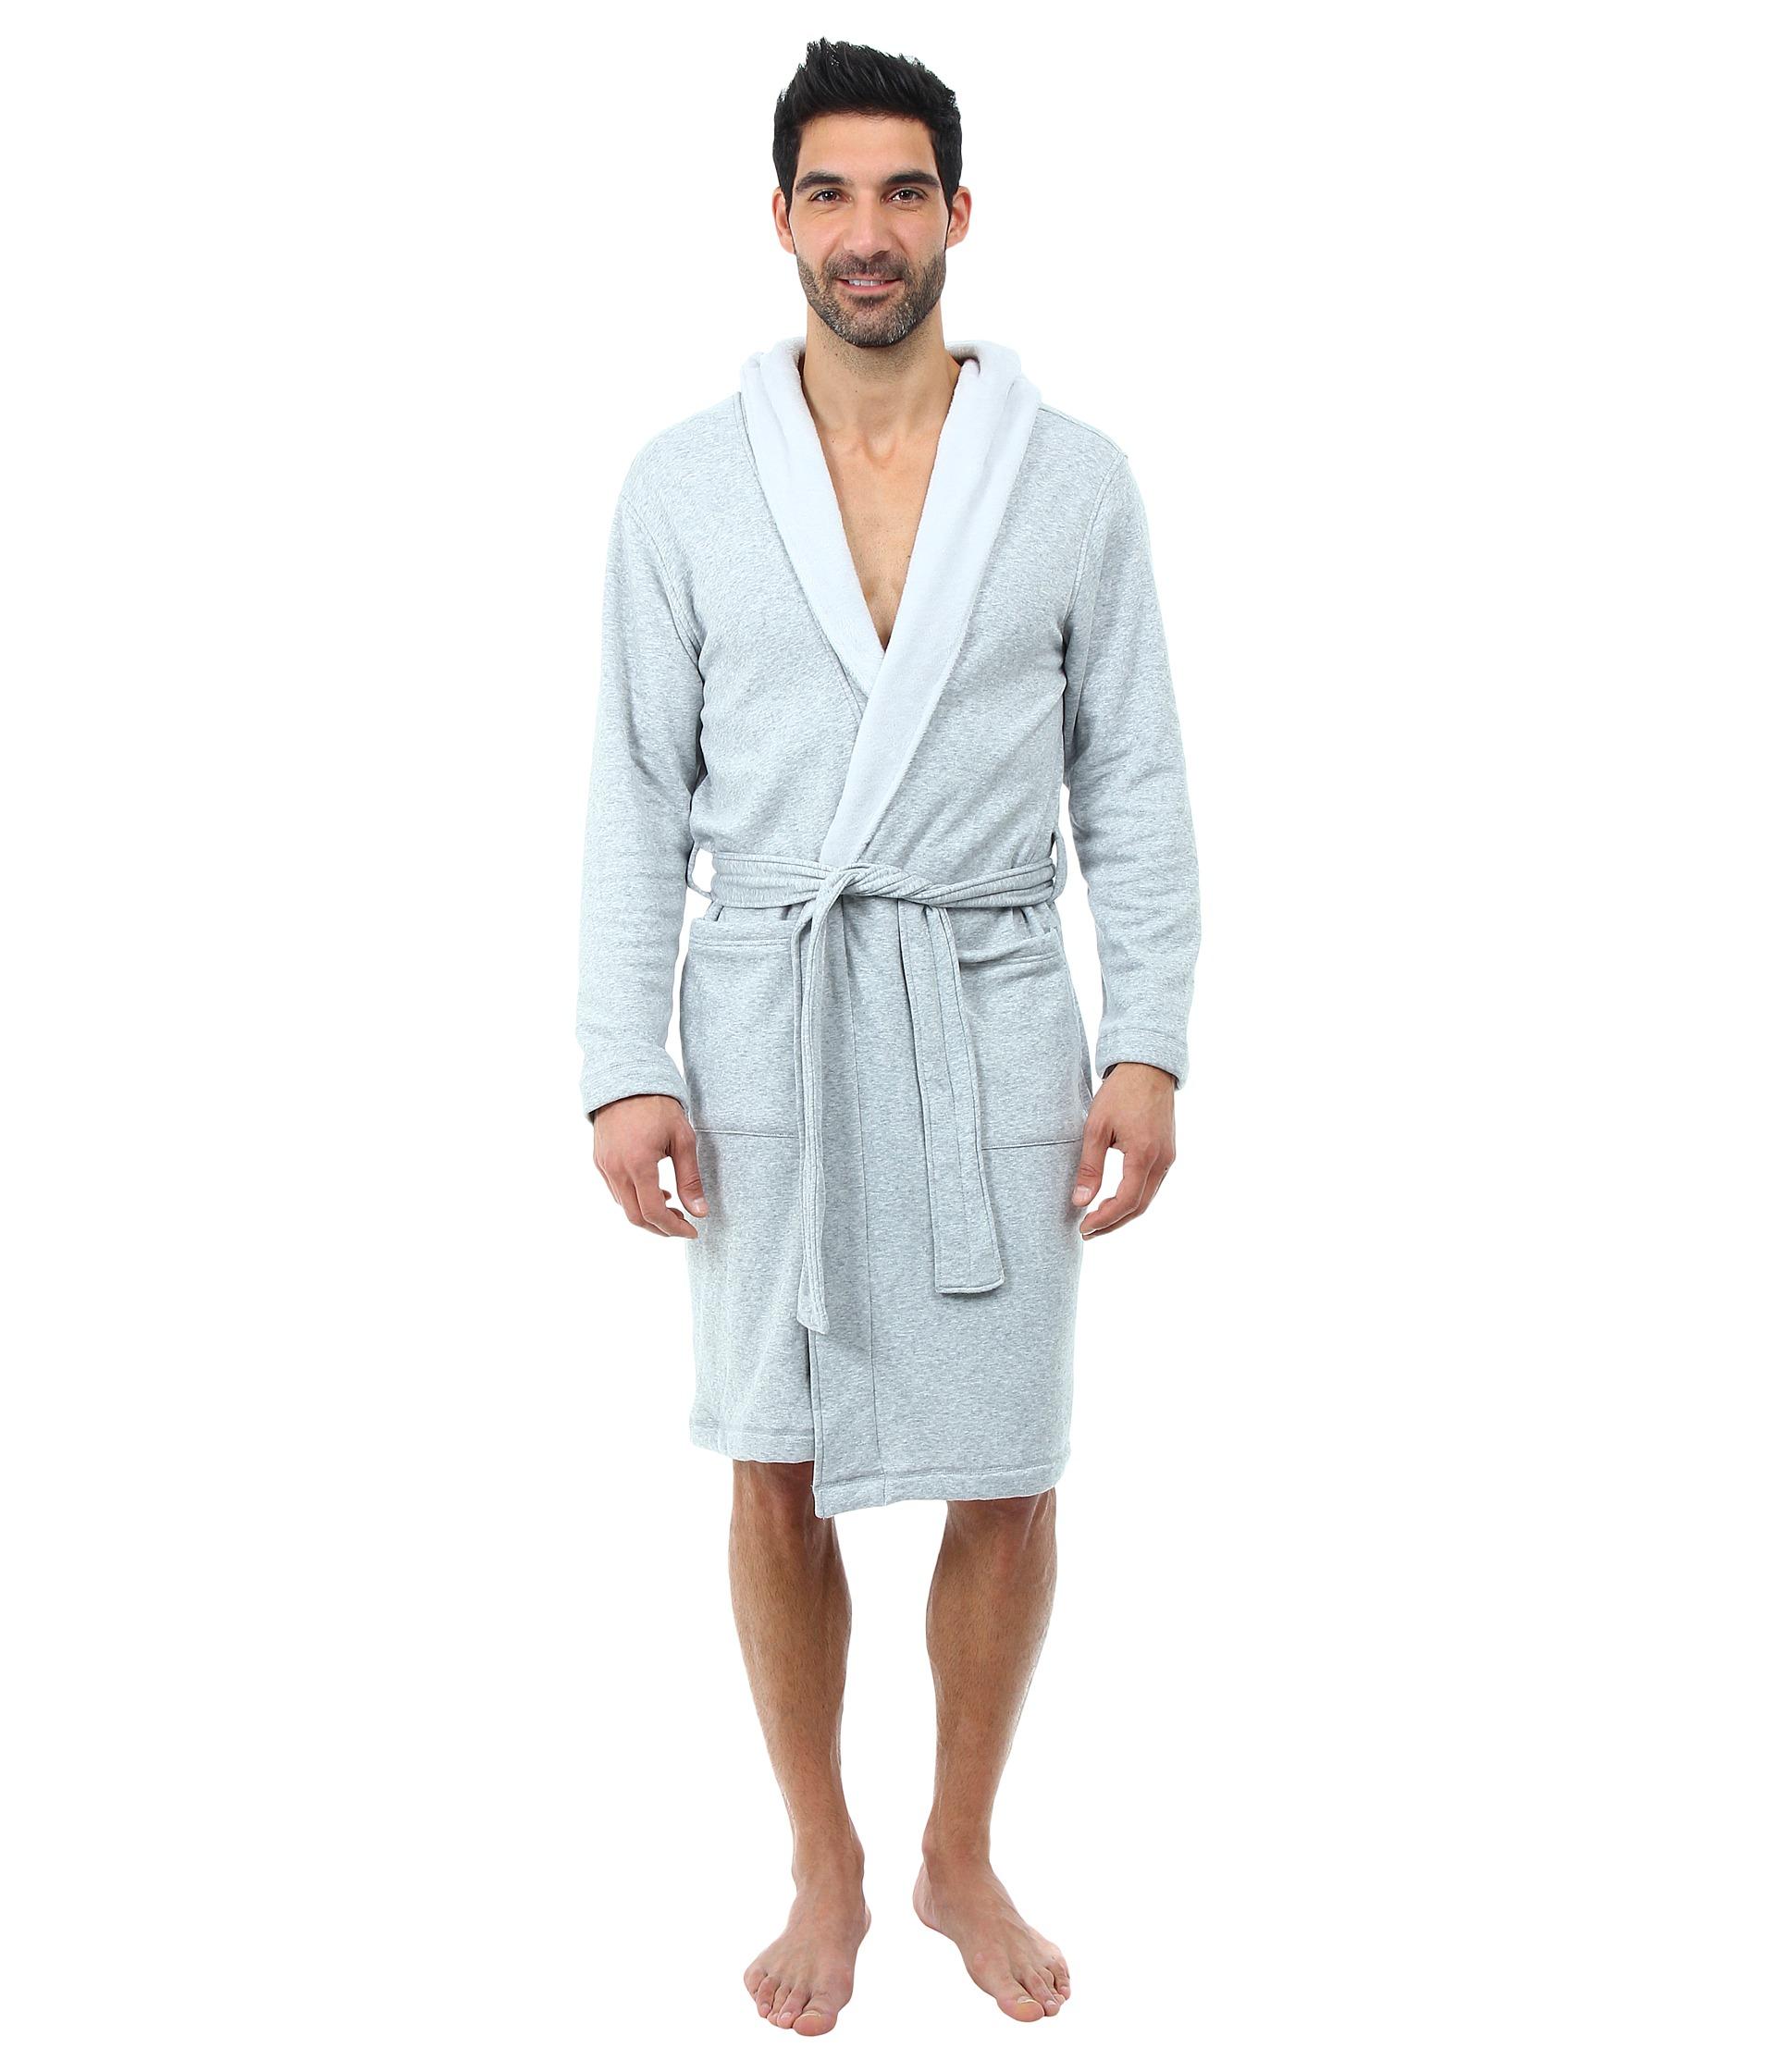 a30c891703 Lyst - Ugg Alsten Robe in Blue for Men